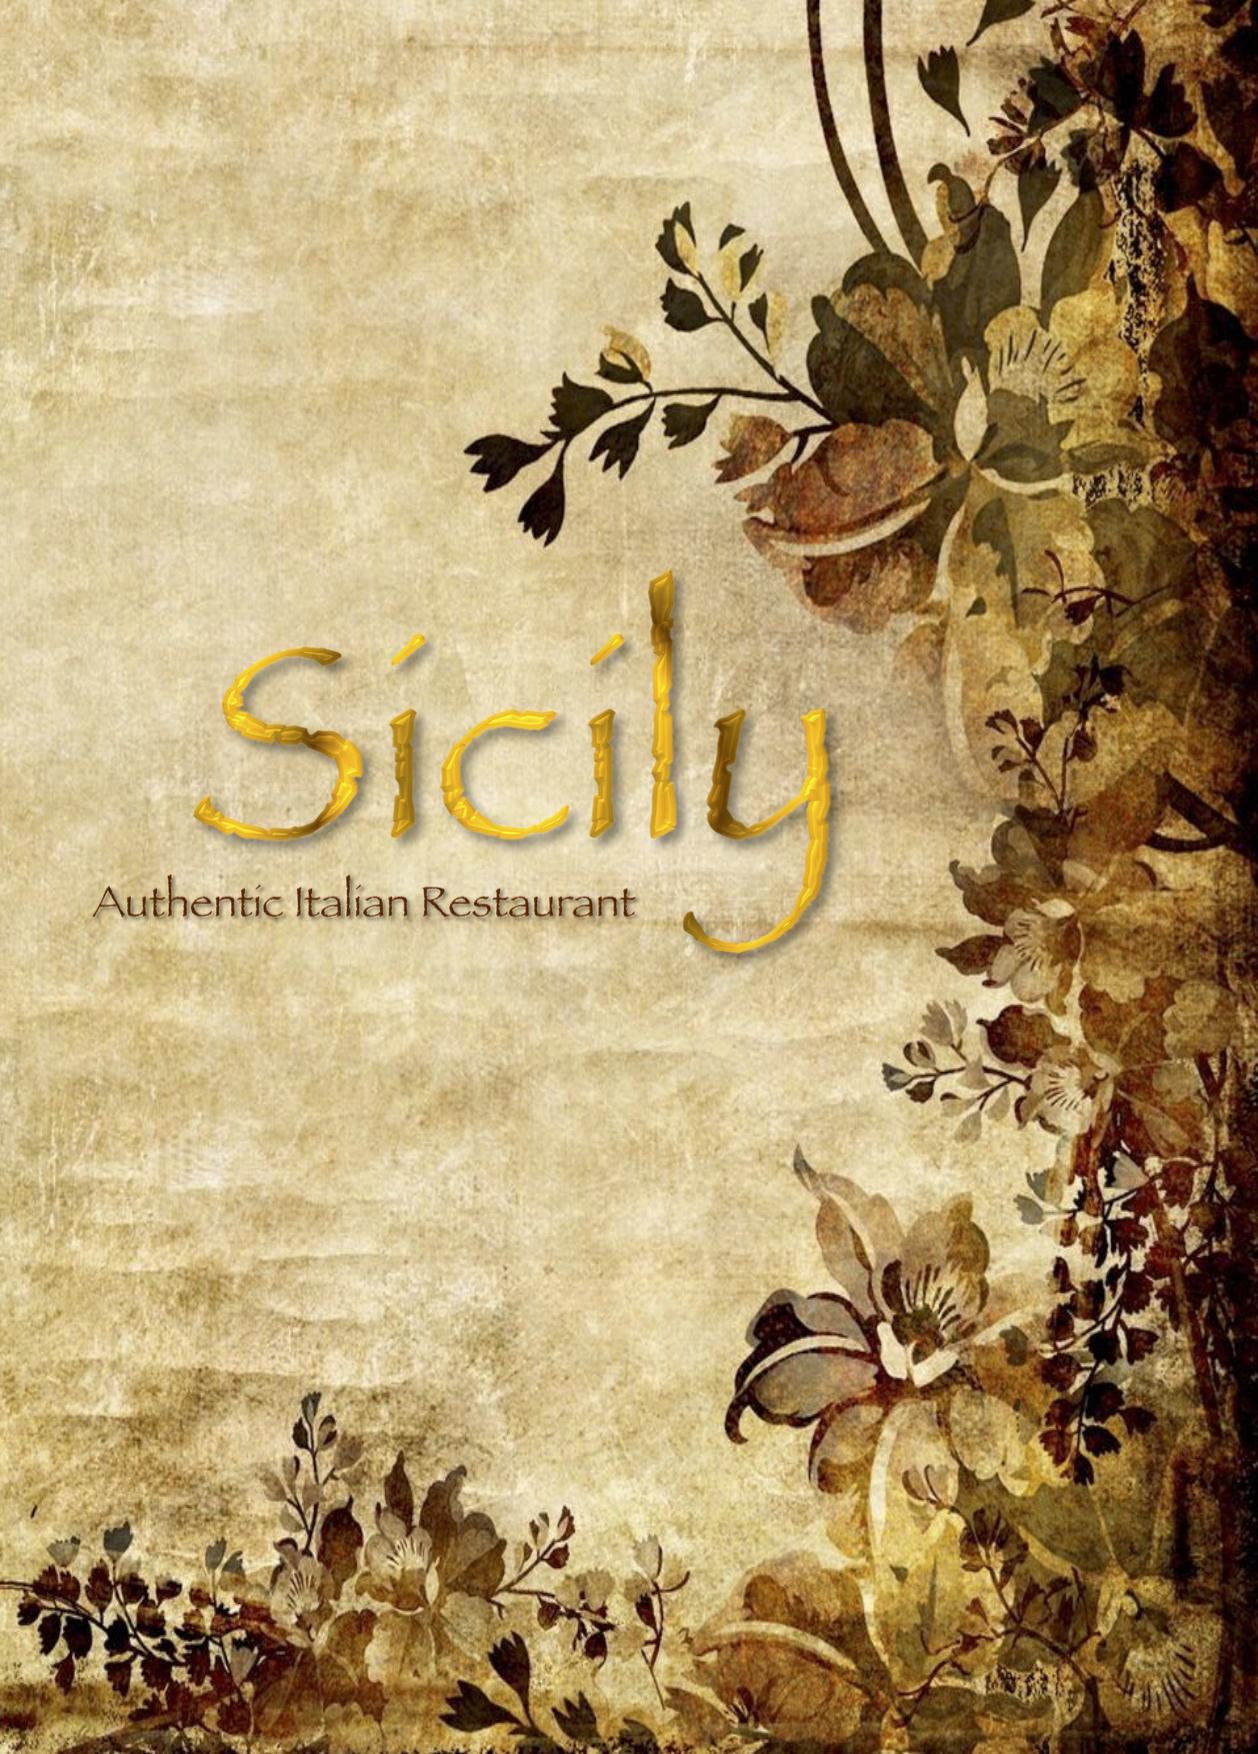 menu 2015 sicily1